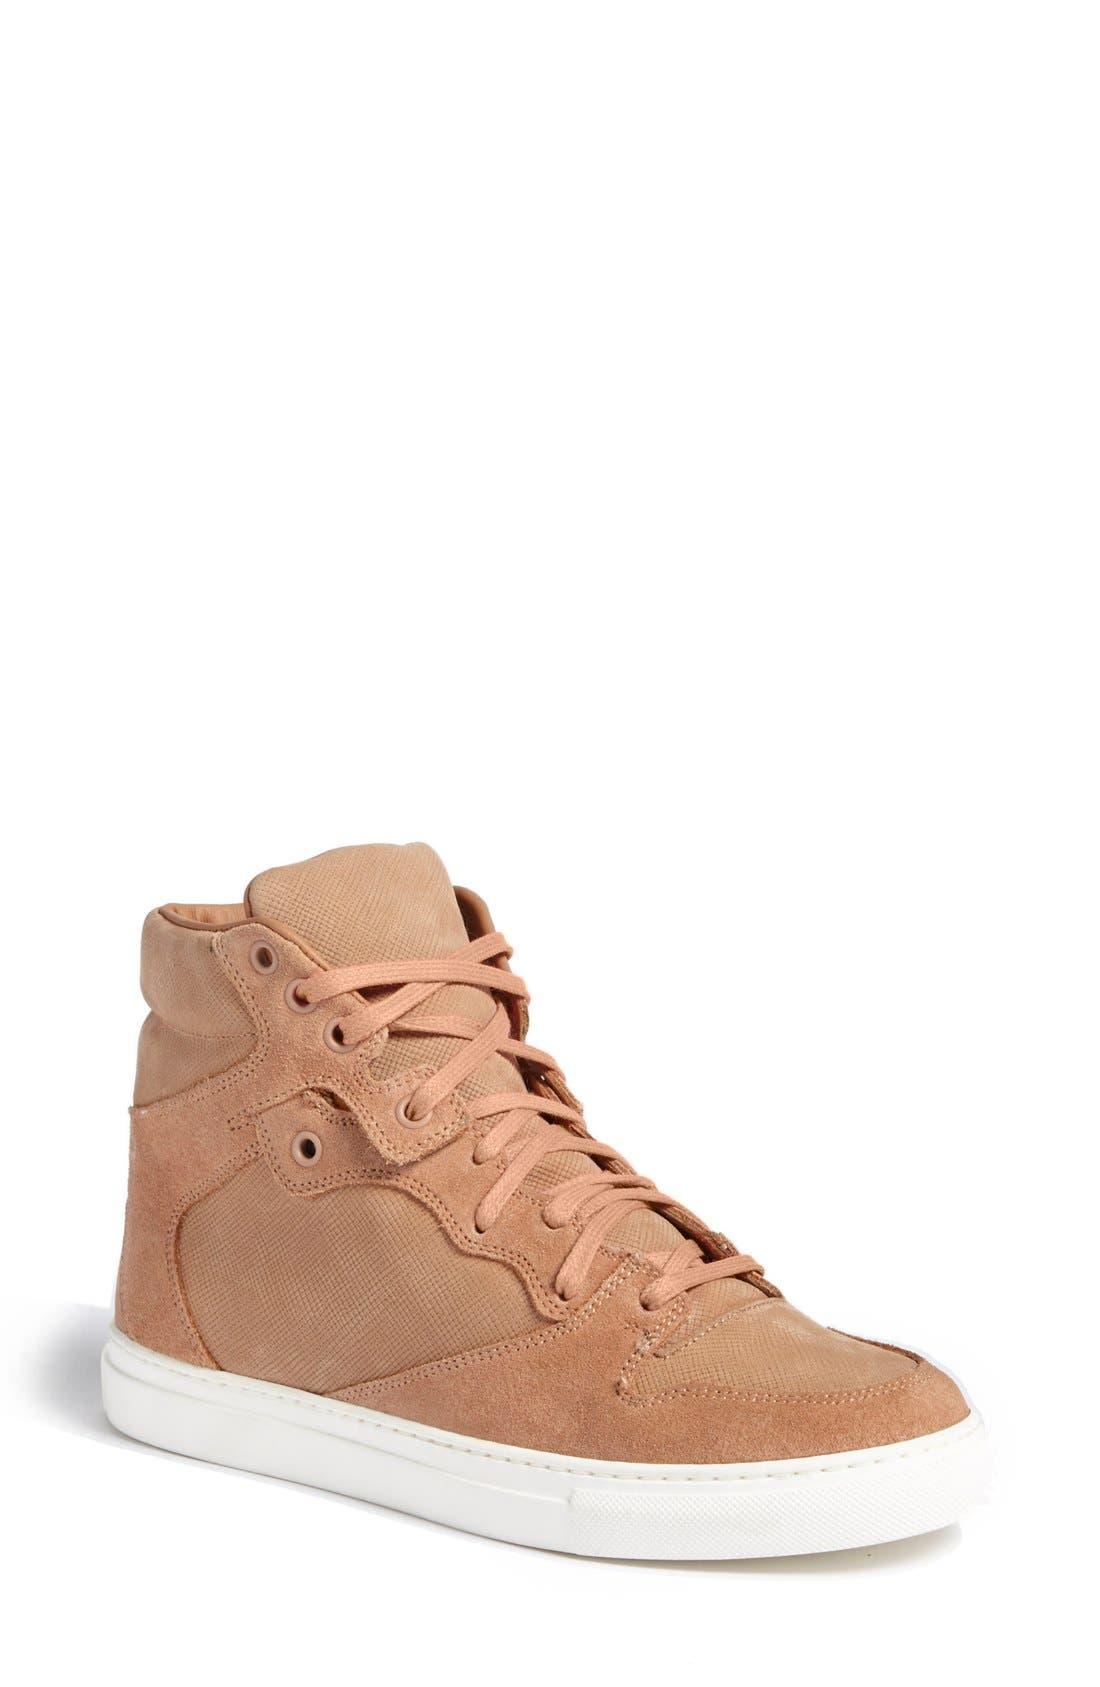 Alternate Image 1 Selected - Balenciaga 'Trainer' High Top Sneaker (Women)